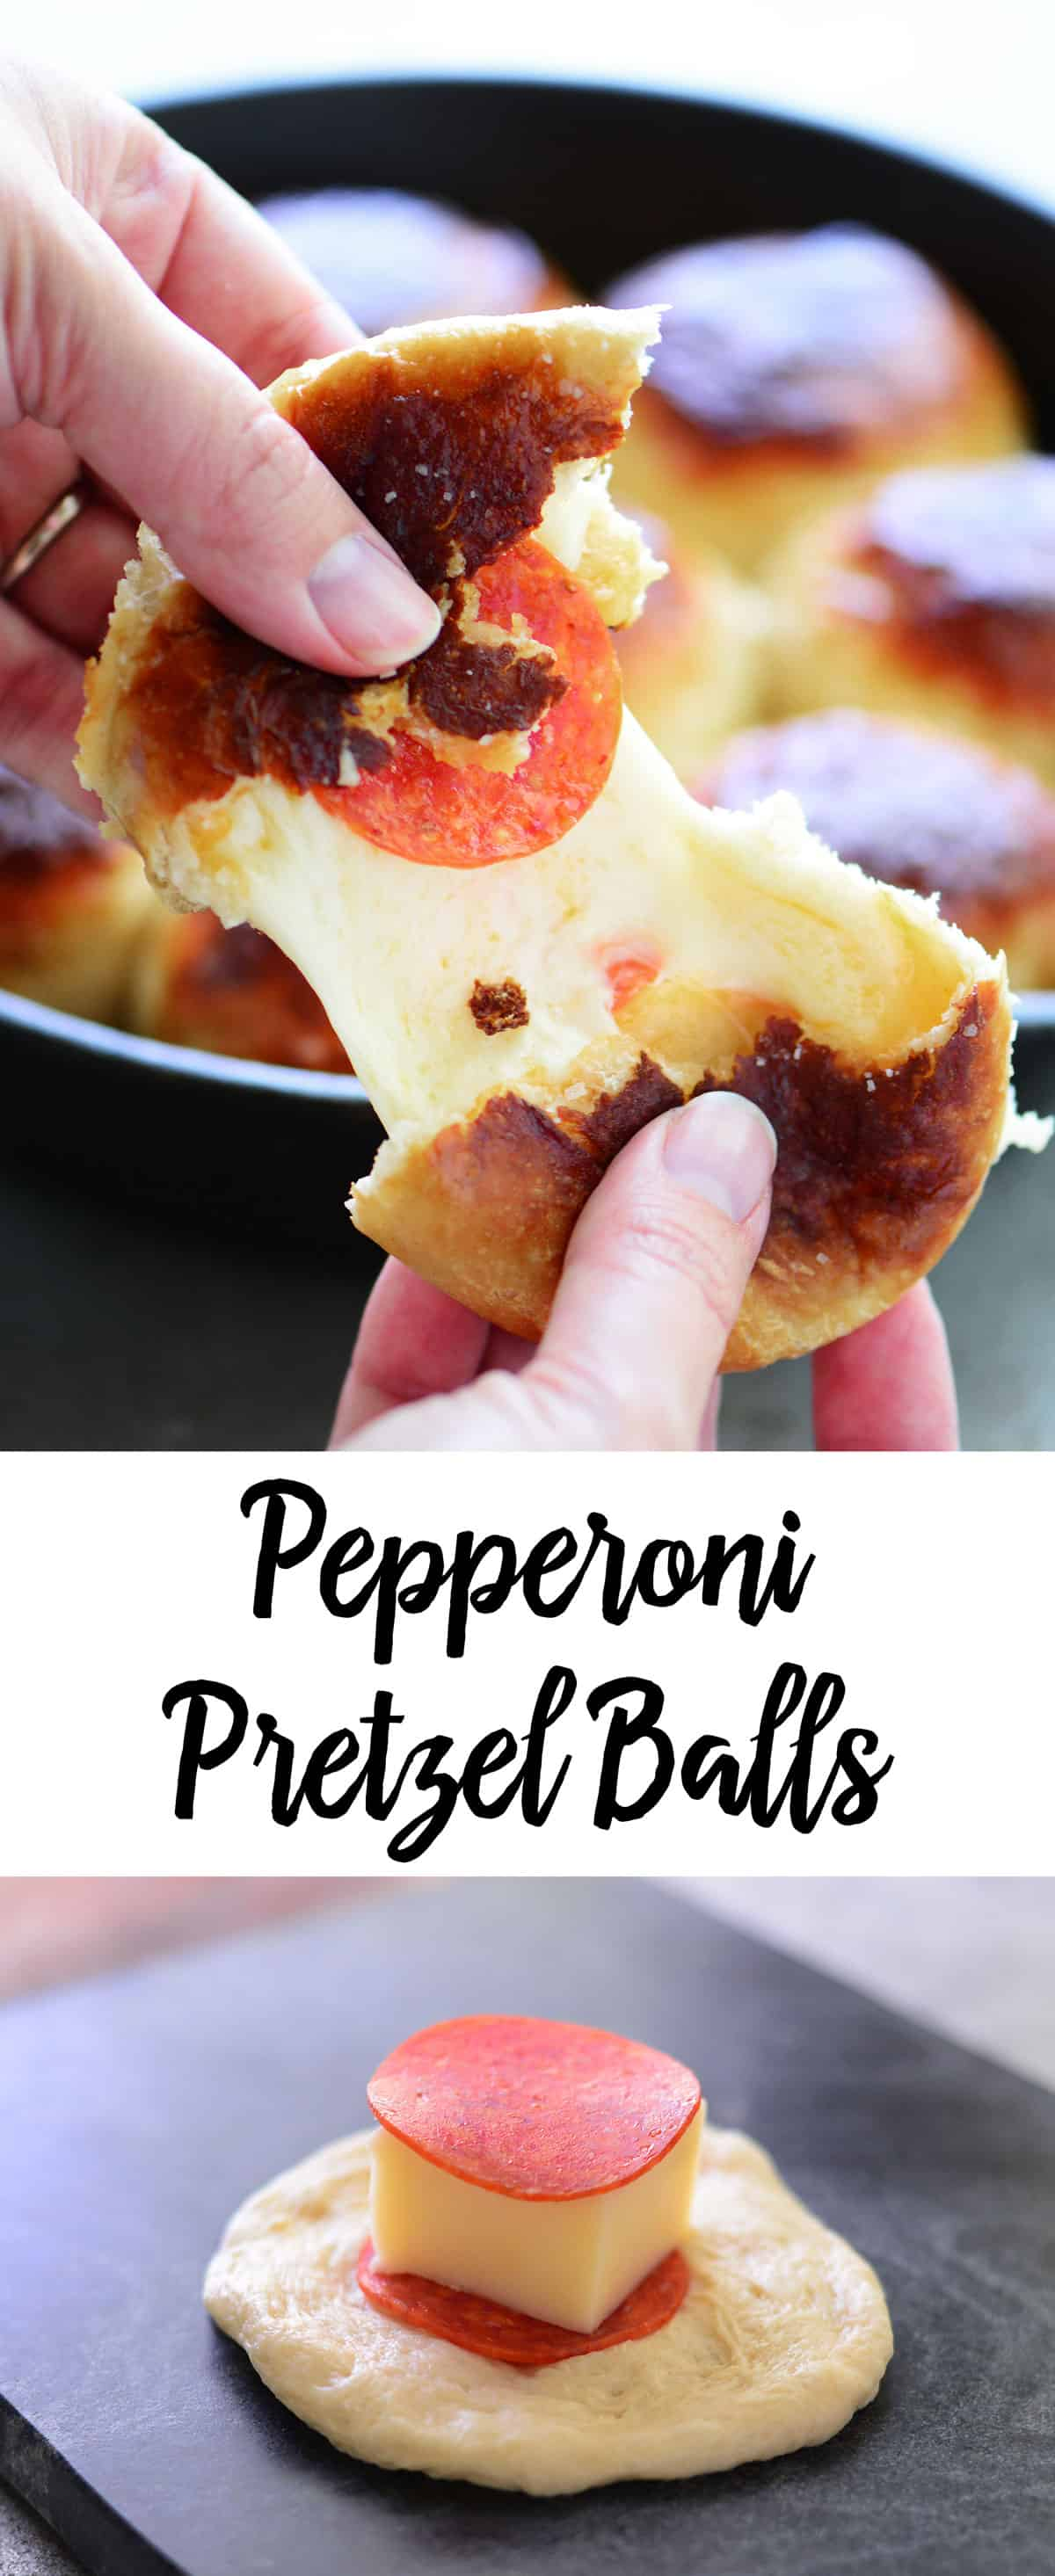 collage of pepperoni pretzel balls photos